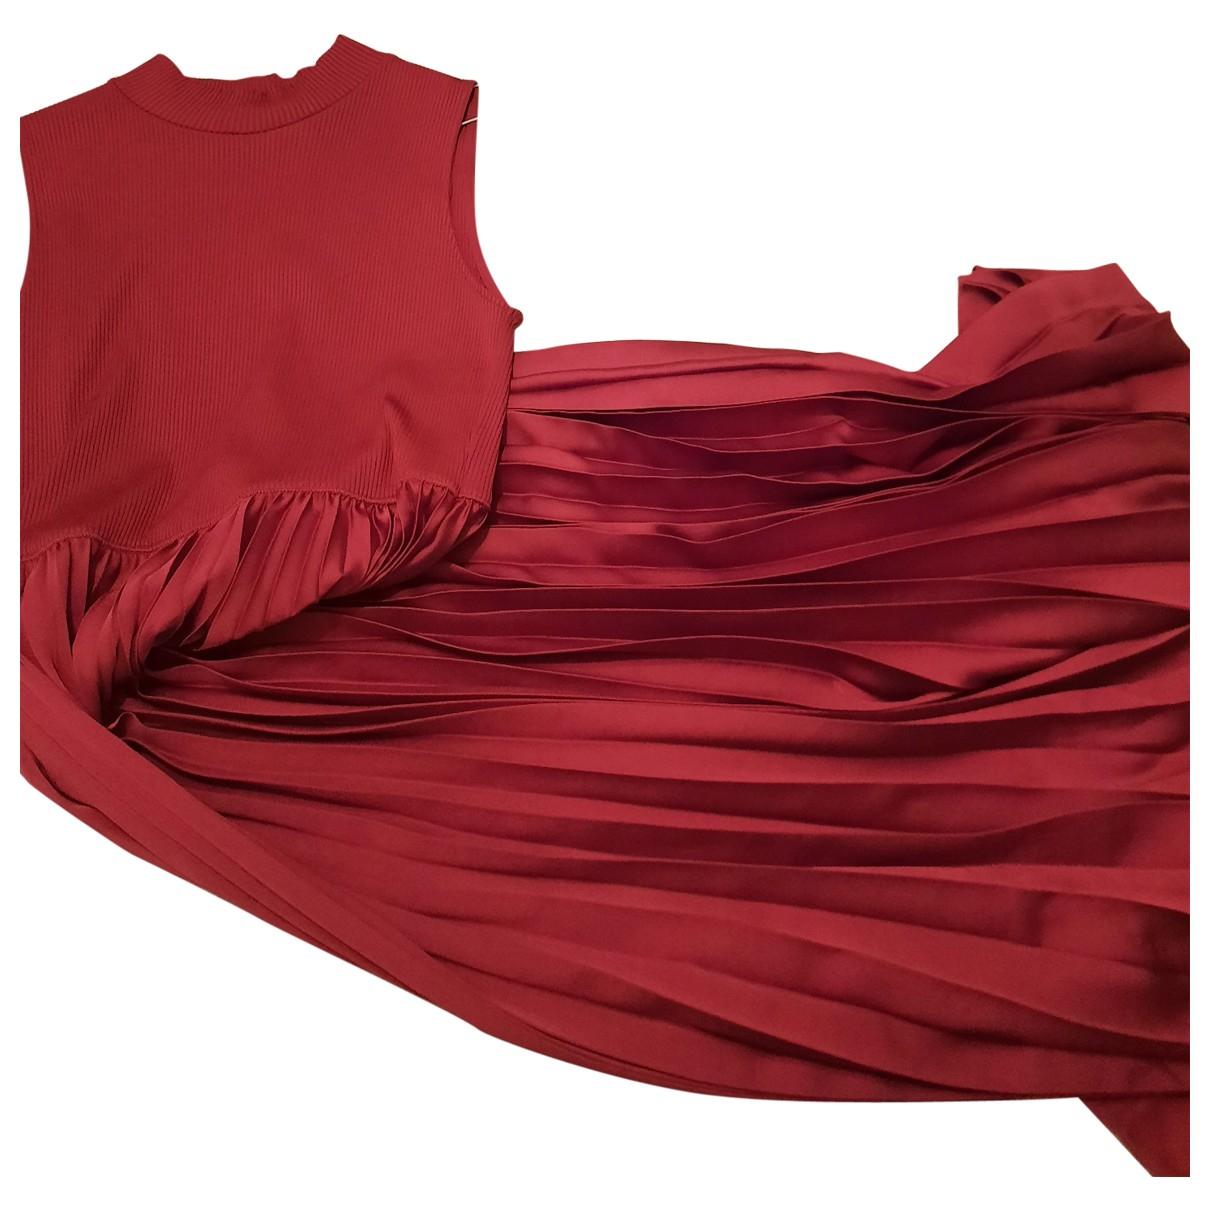 Zara \N Burgundy dress for Women M International